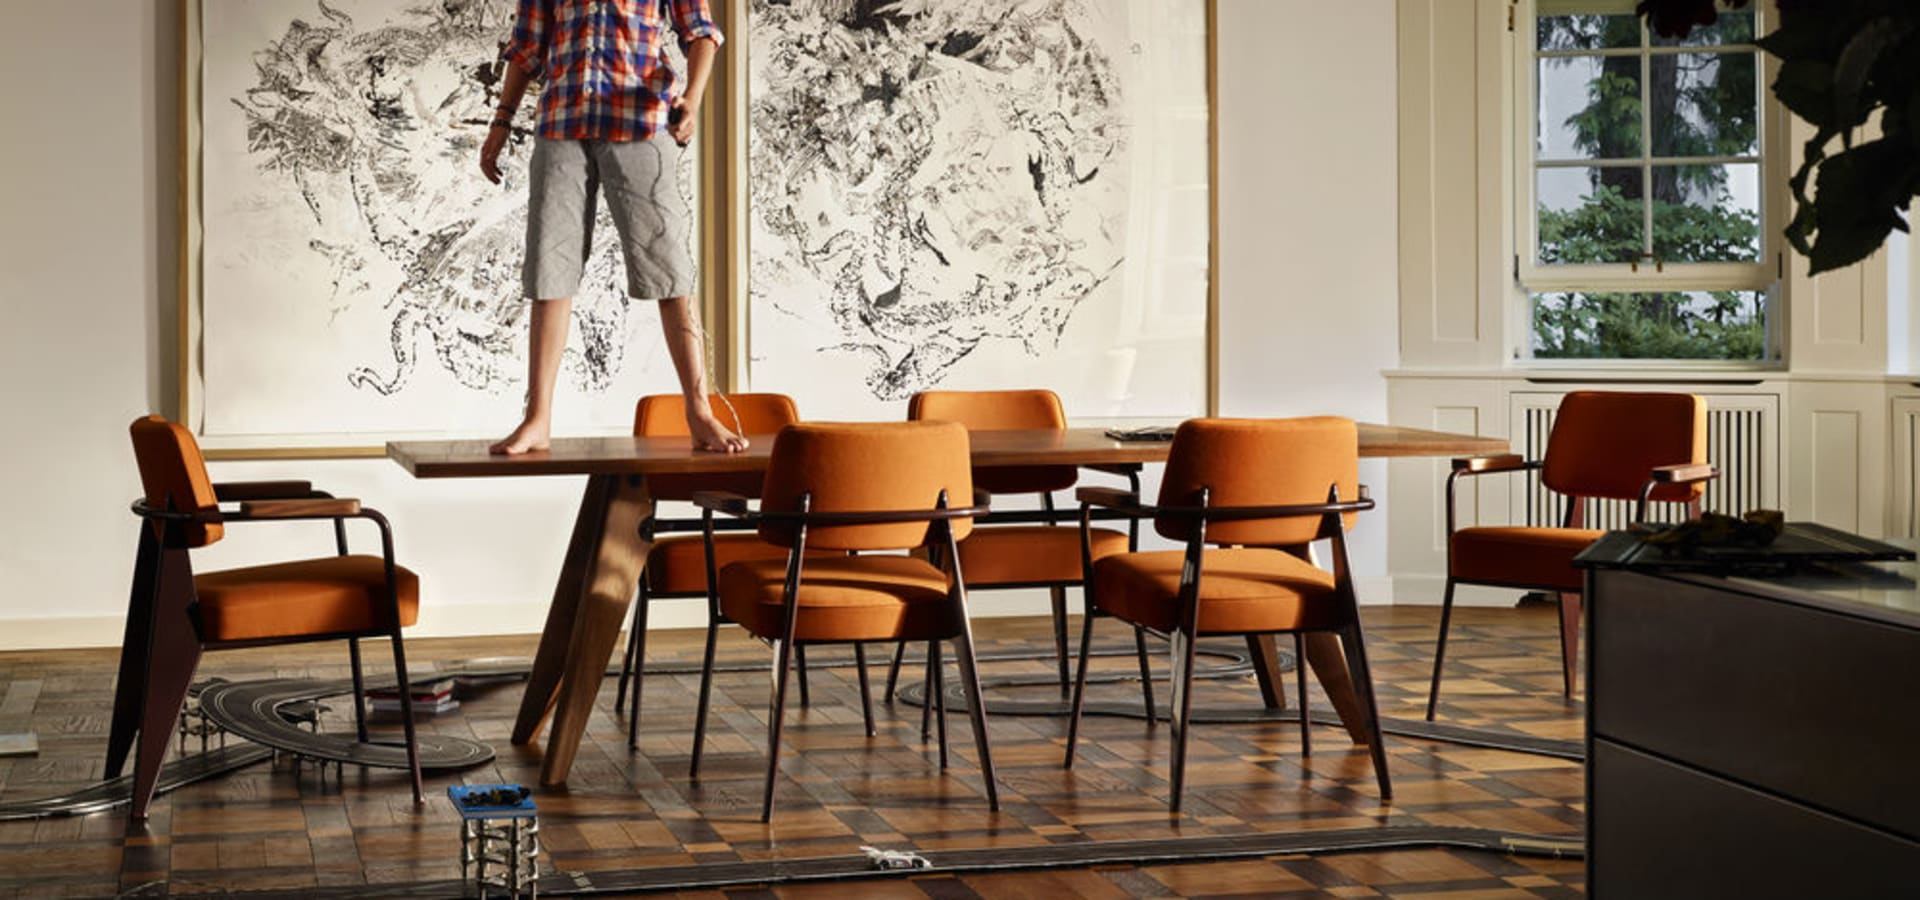 Centro de Diseño Alemán